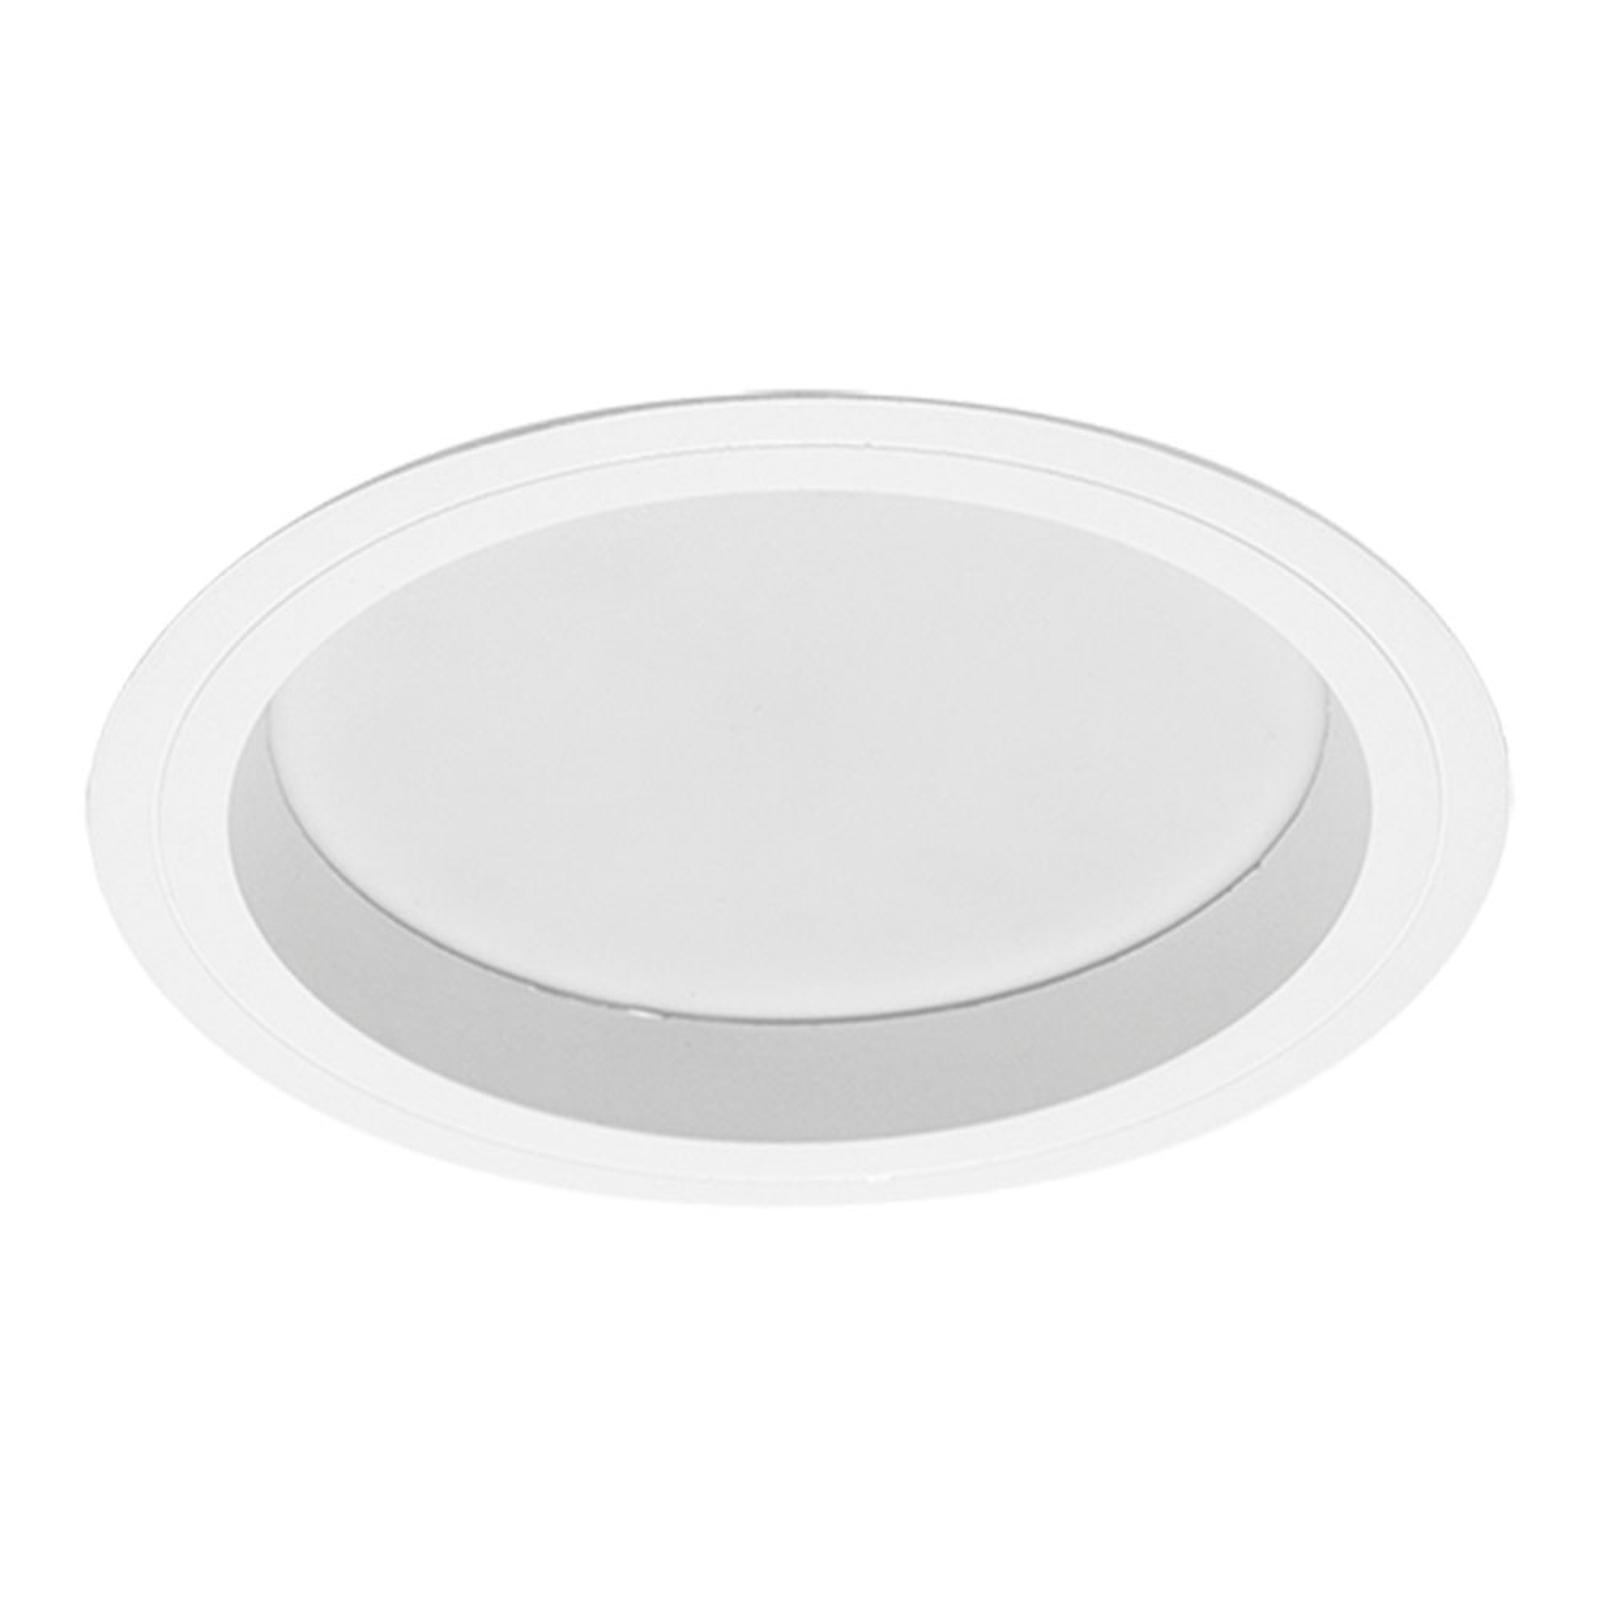 LED-Einbauleuchte relo-RDES-O/190 2.014lm 4.000K